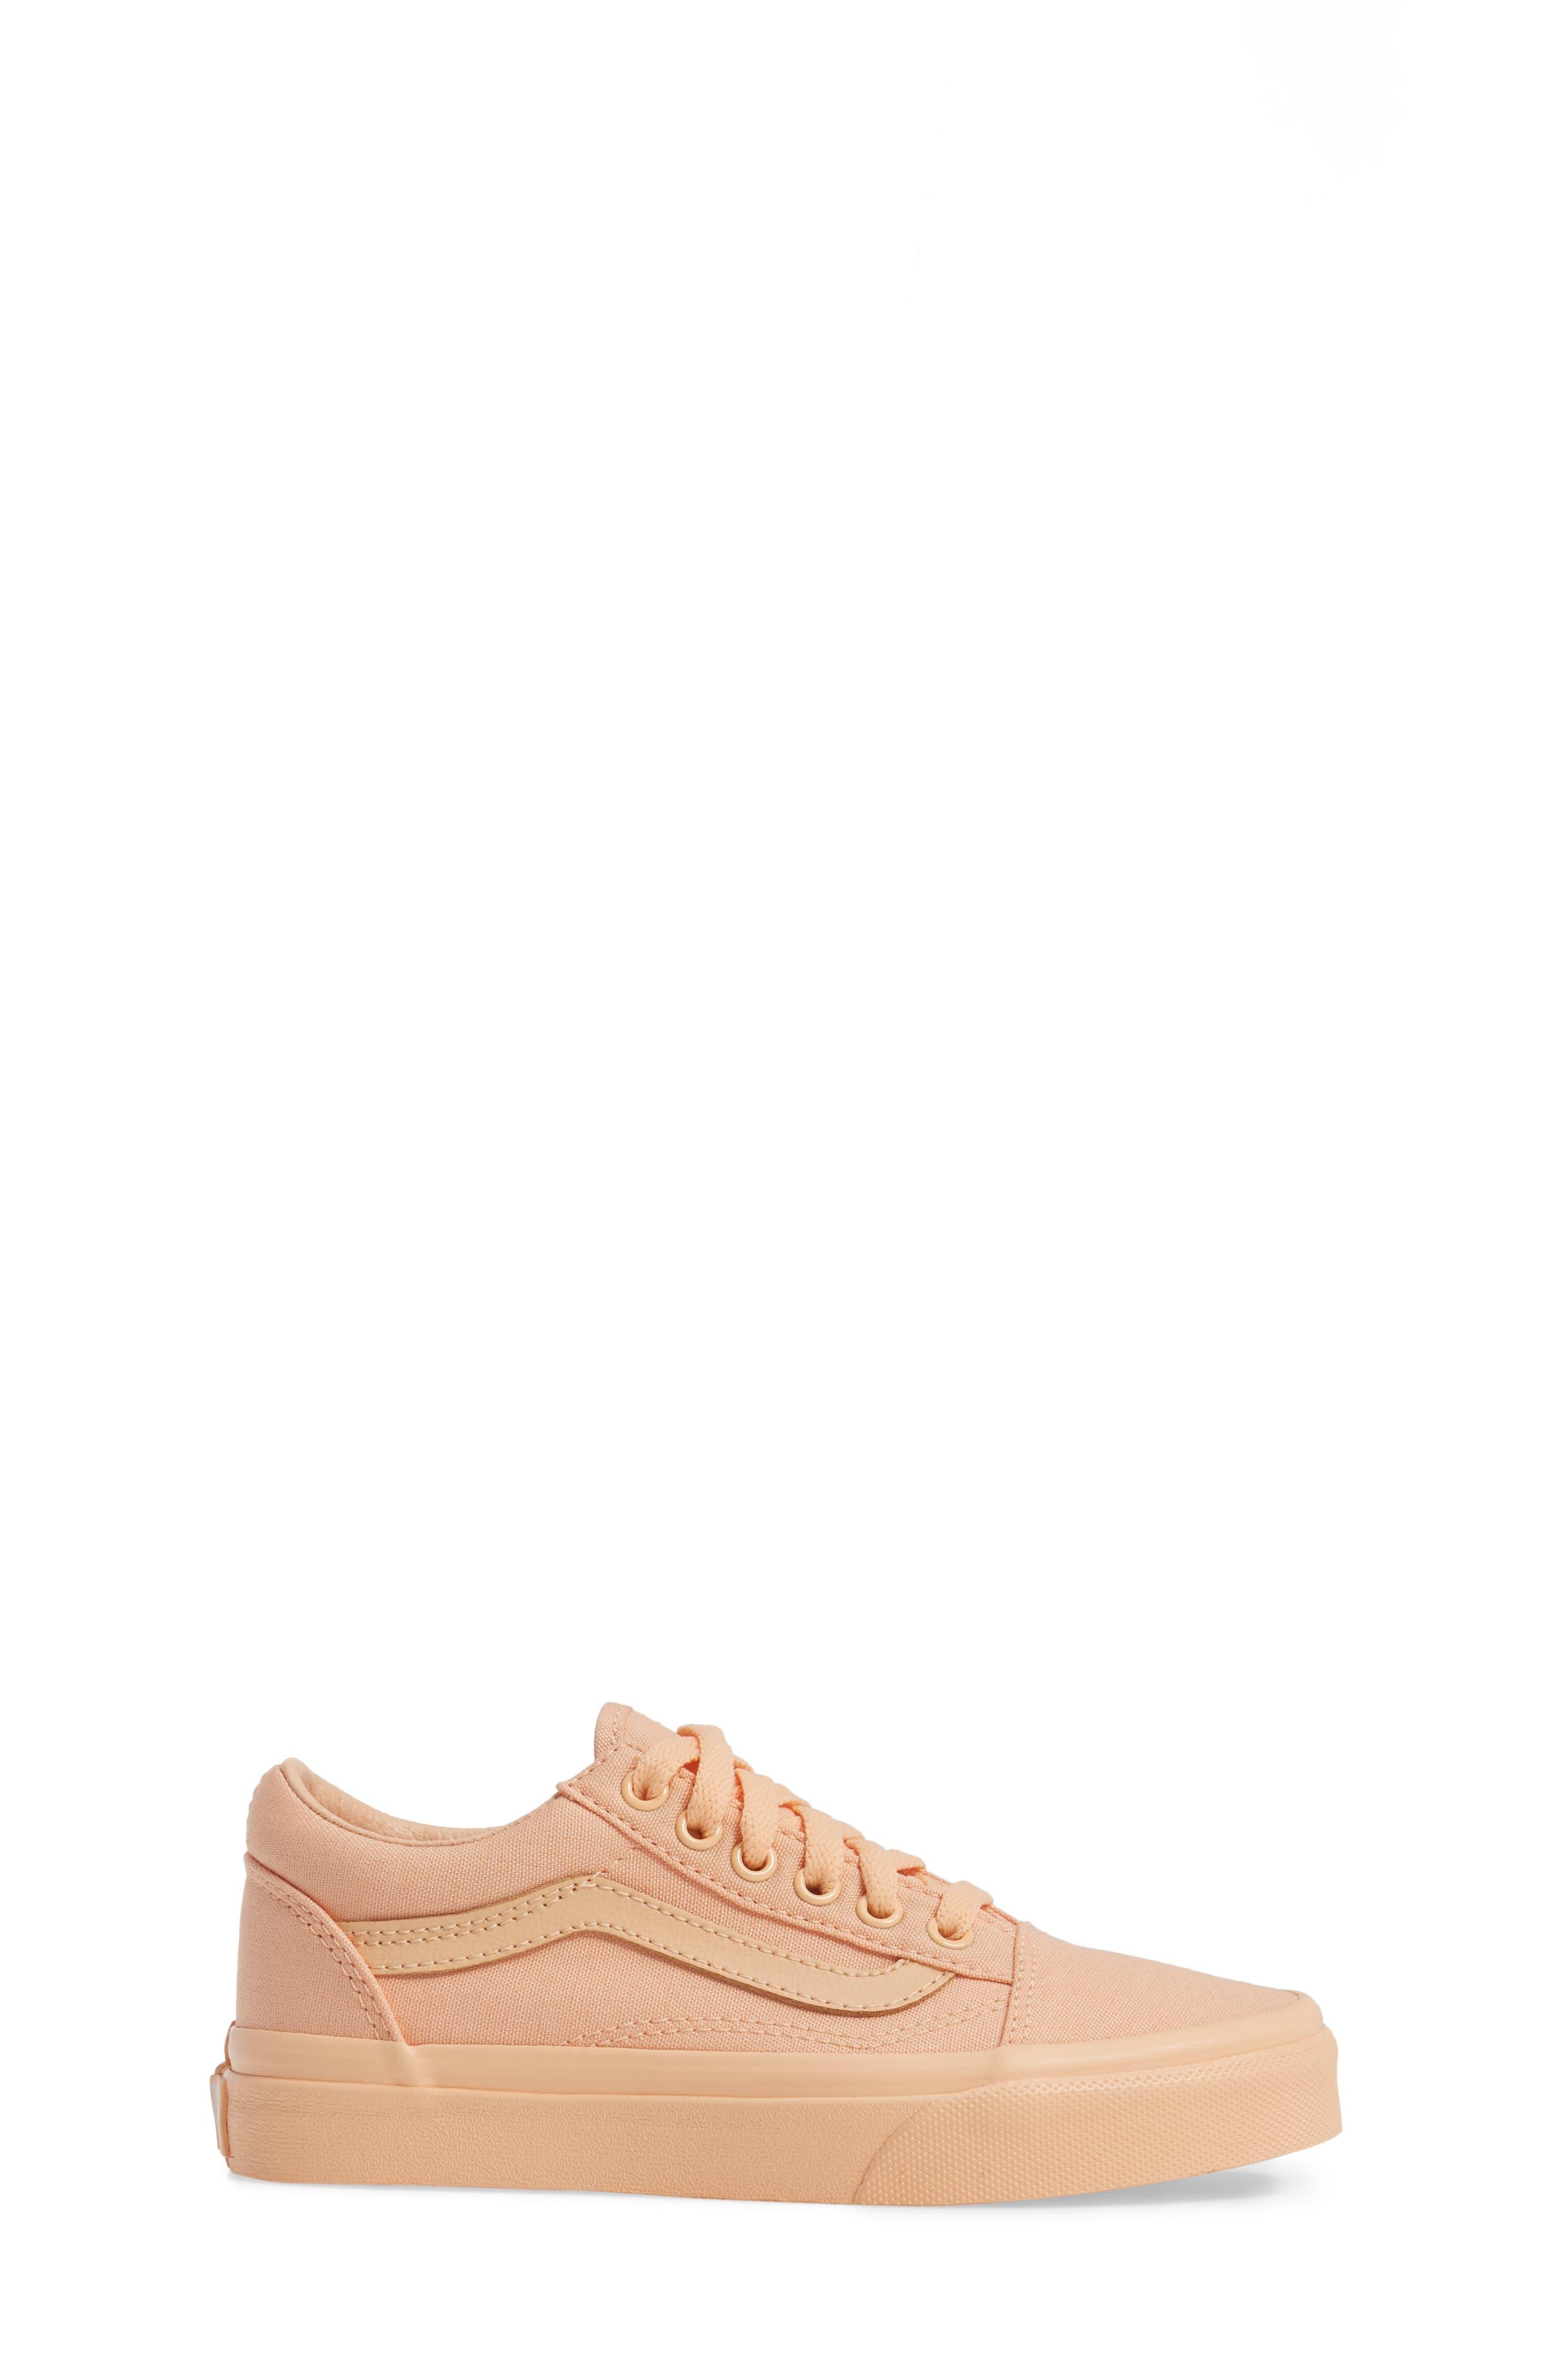 Old Skool Sneaker,                             Alternate thumbnail 6, color,